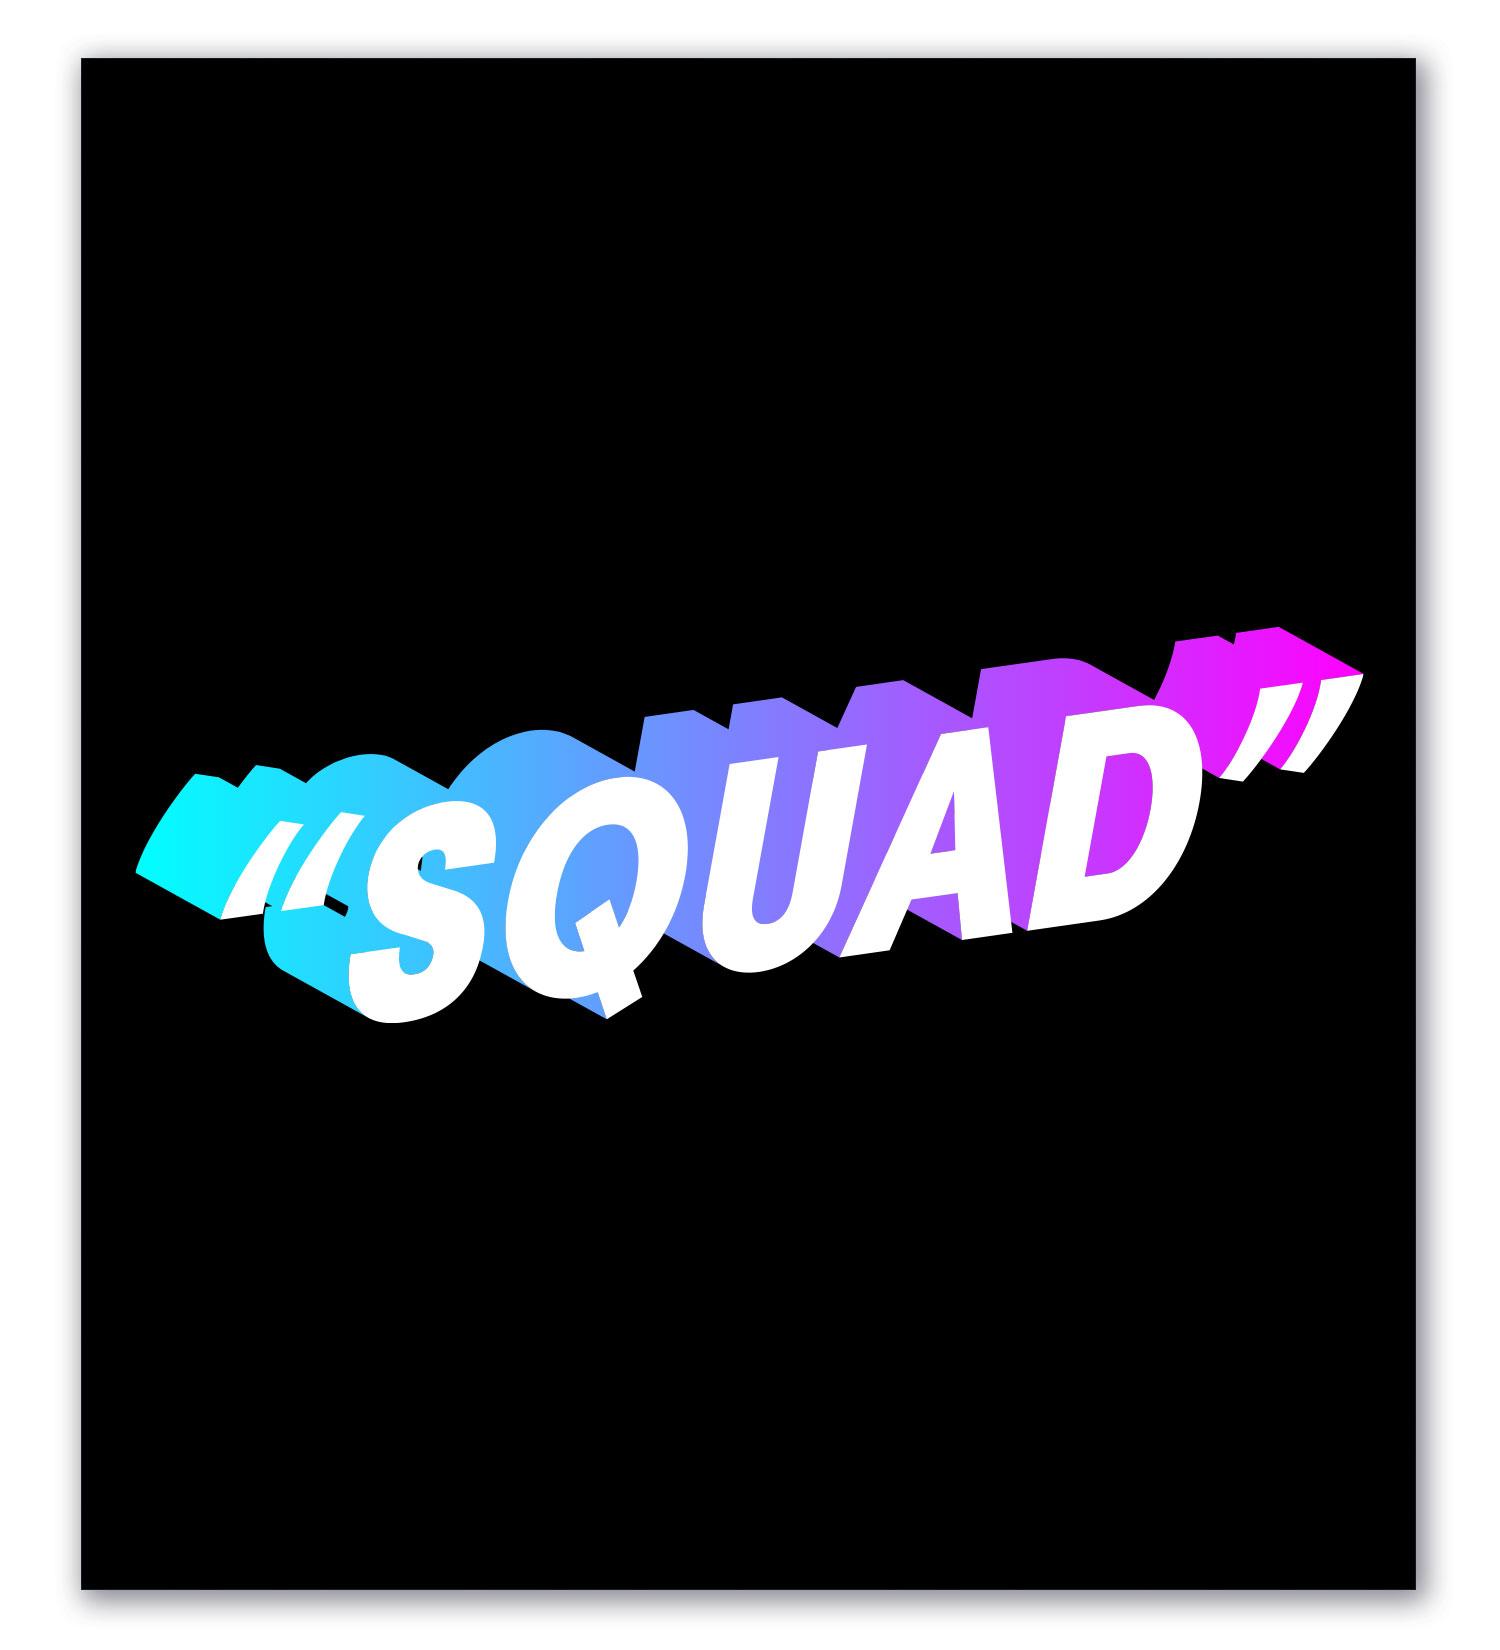 Squad-img